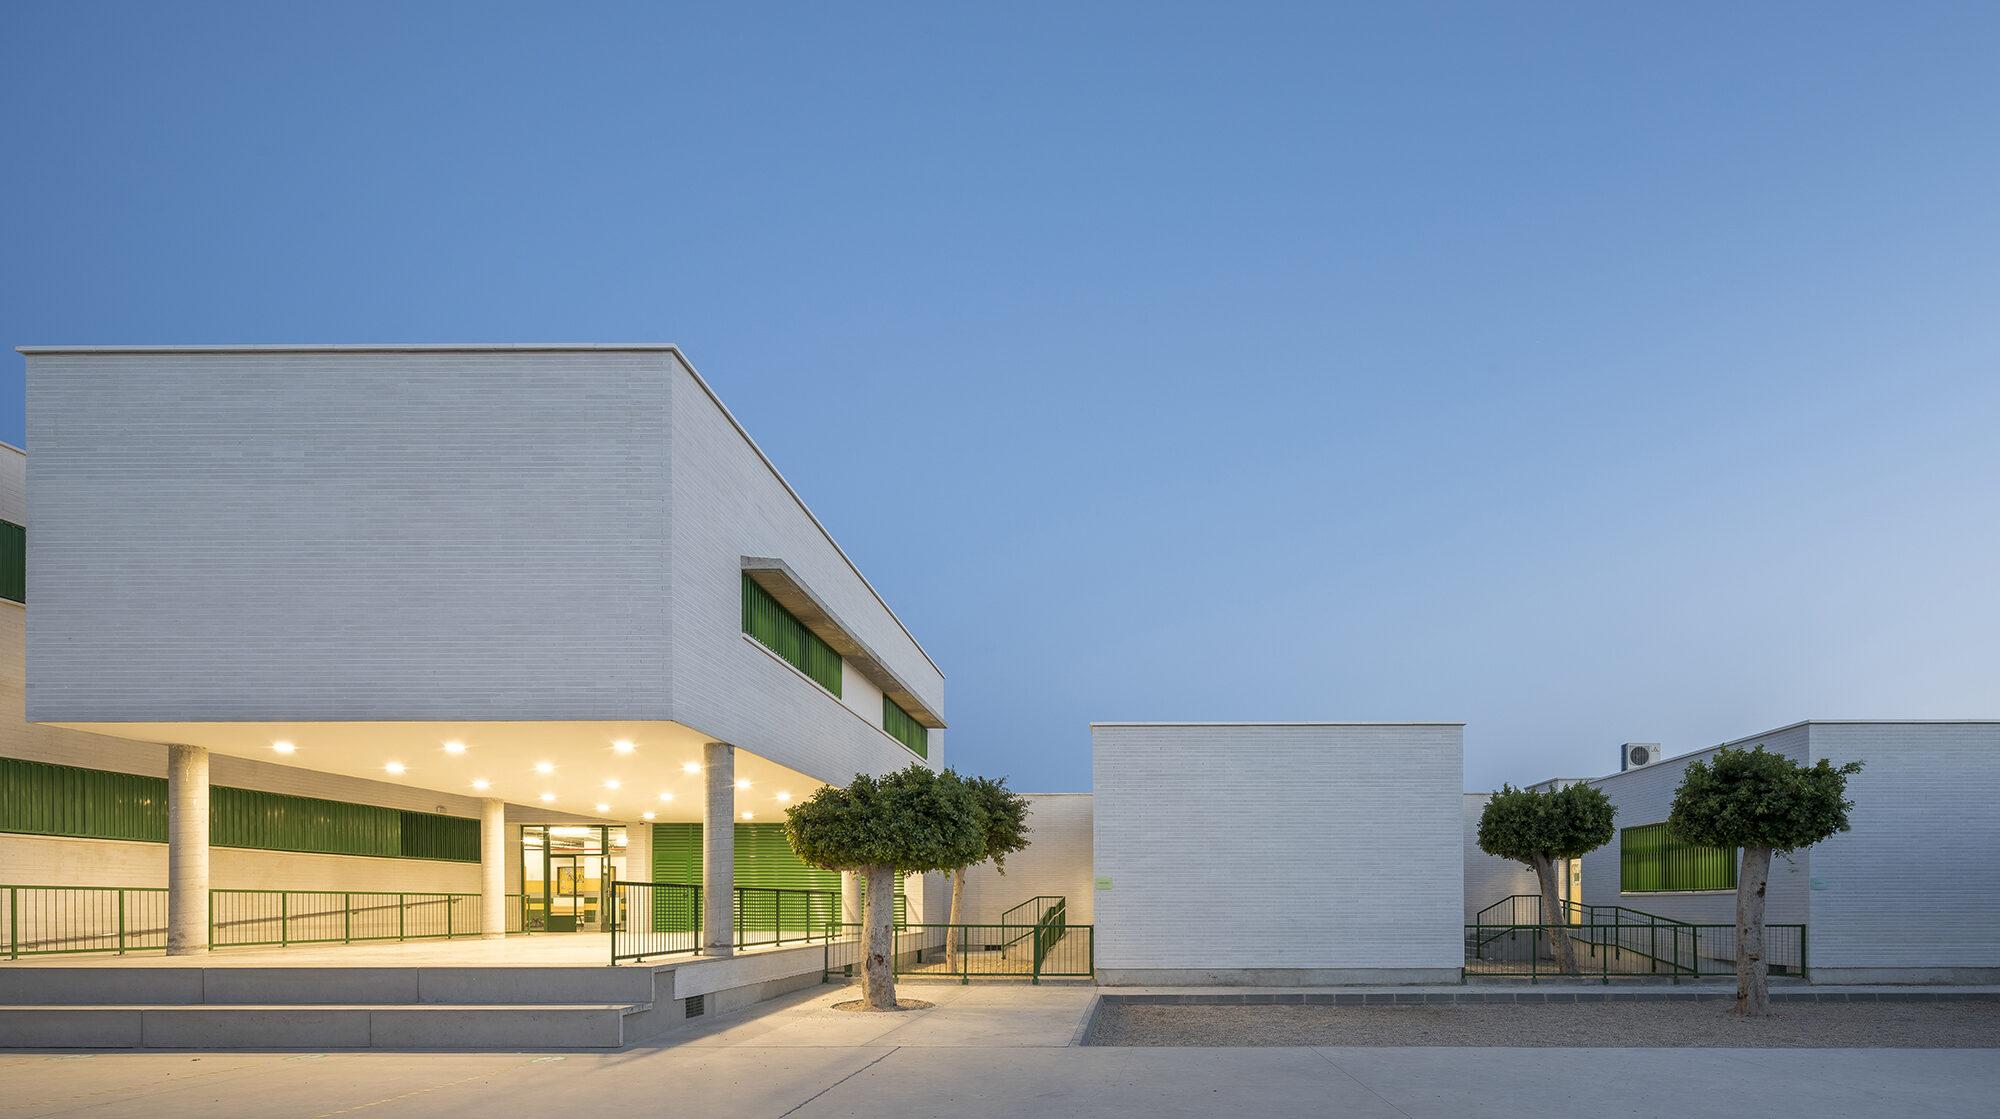 Colegio Público Juan Sebastián Elcano - Nijár